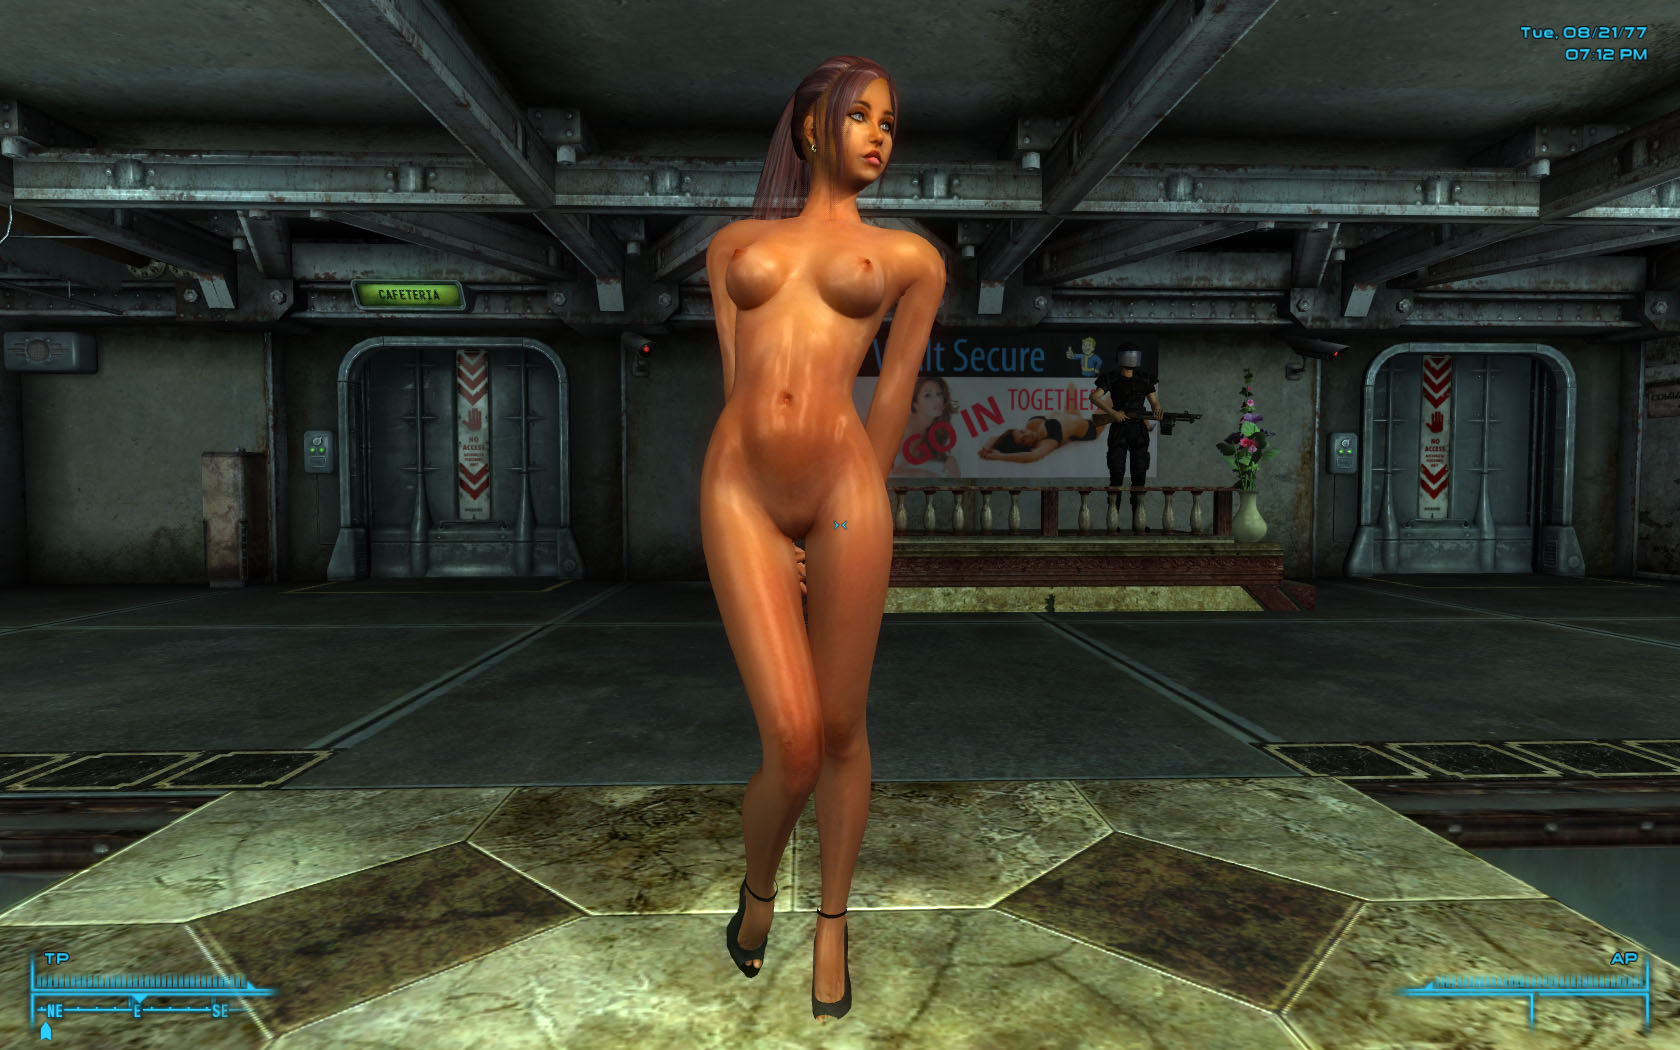 Naked girls playing fallout #1